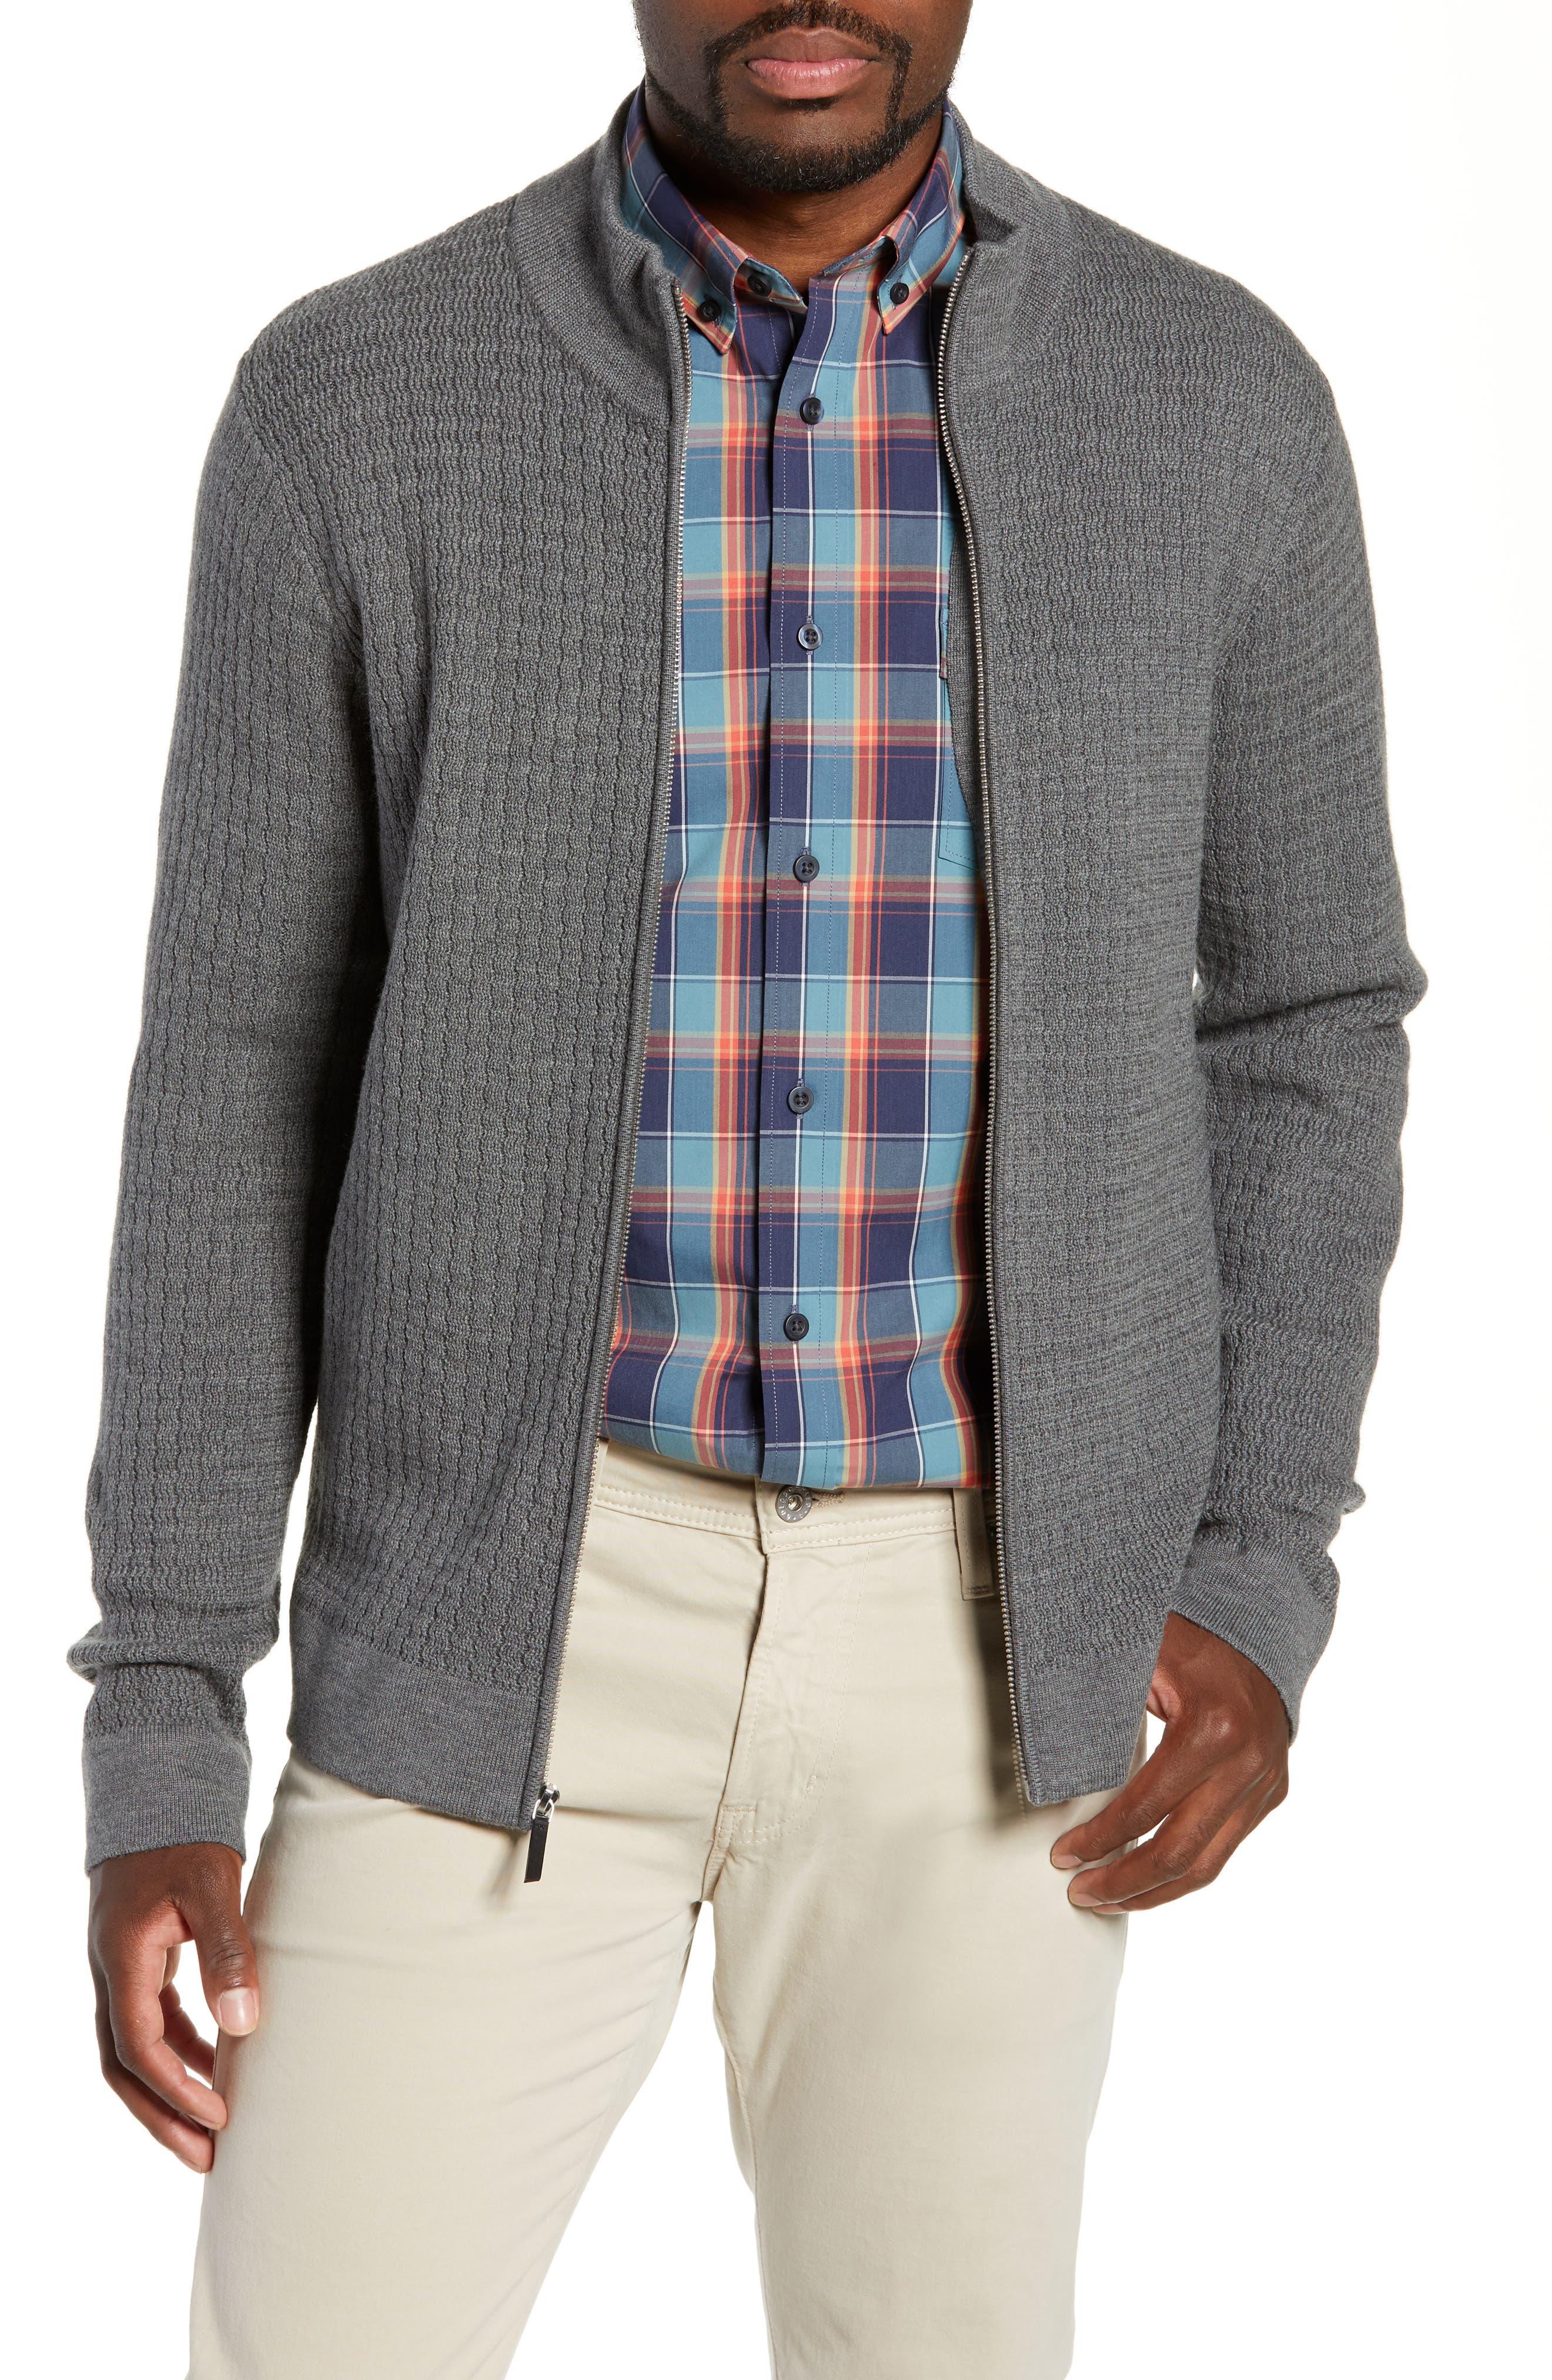 Nordstrom Signature Merino Wool Zip Cardigan, Grey